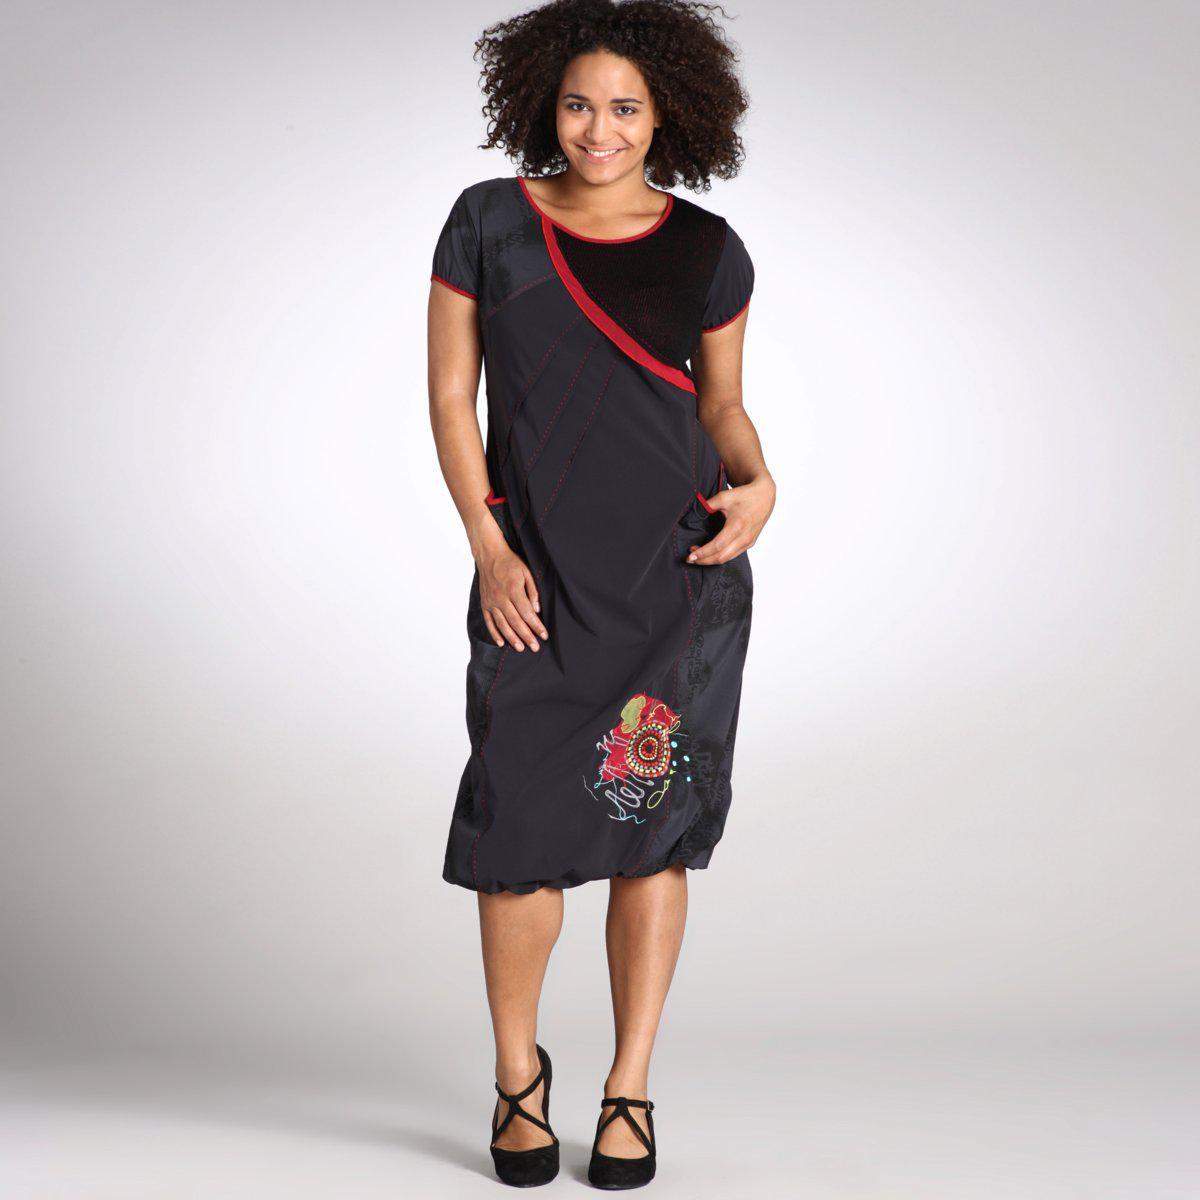 aa94c7749135 Βραδυνα Φορεματα LaRedoute Φθινόπωρο 2011 Κωδ. 324216445